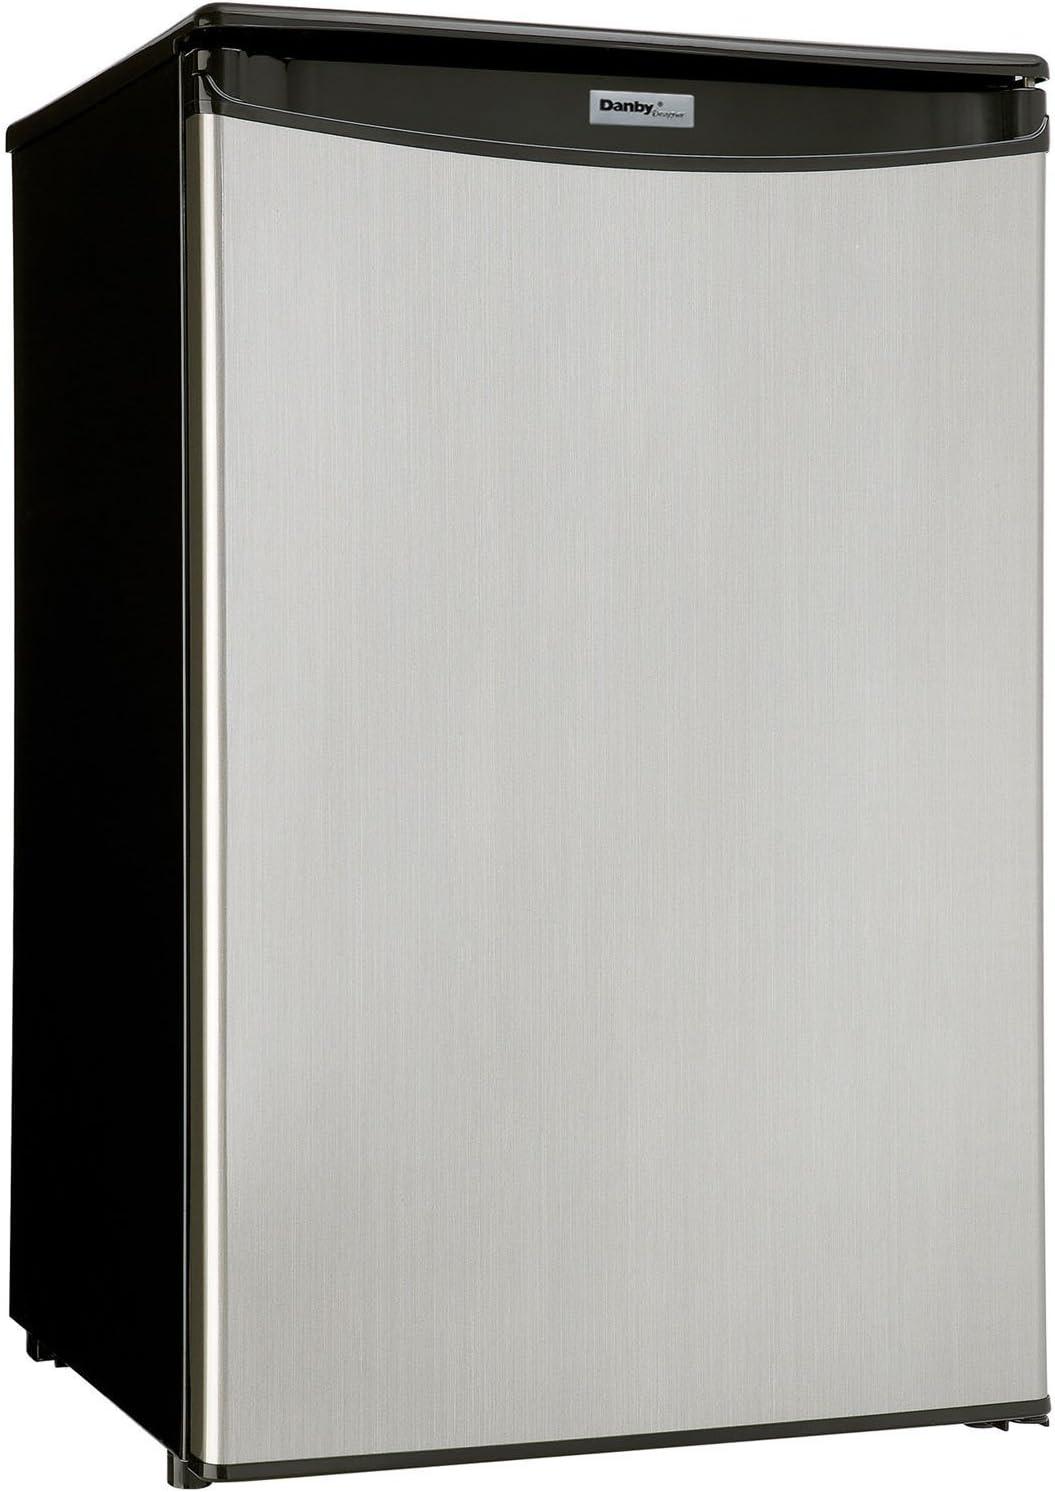 Danby DAR044A5BSLDD Compact Refrigerator